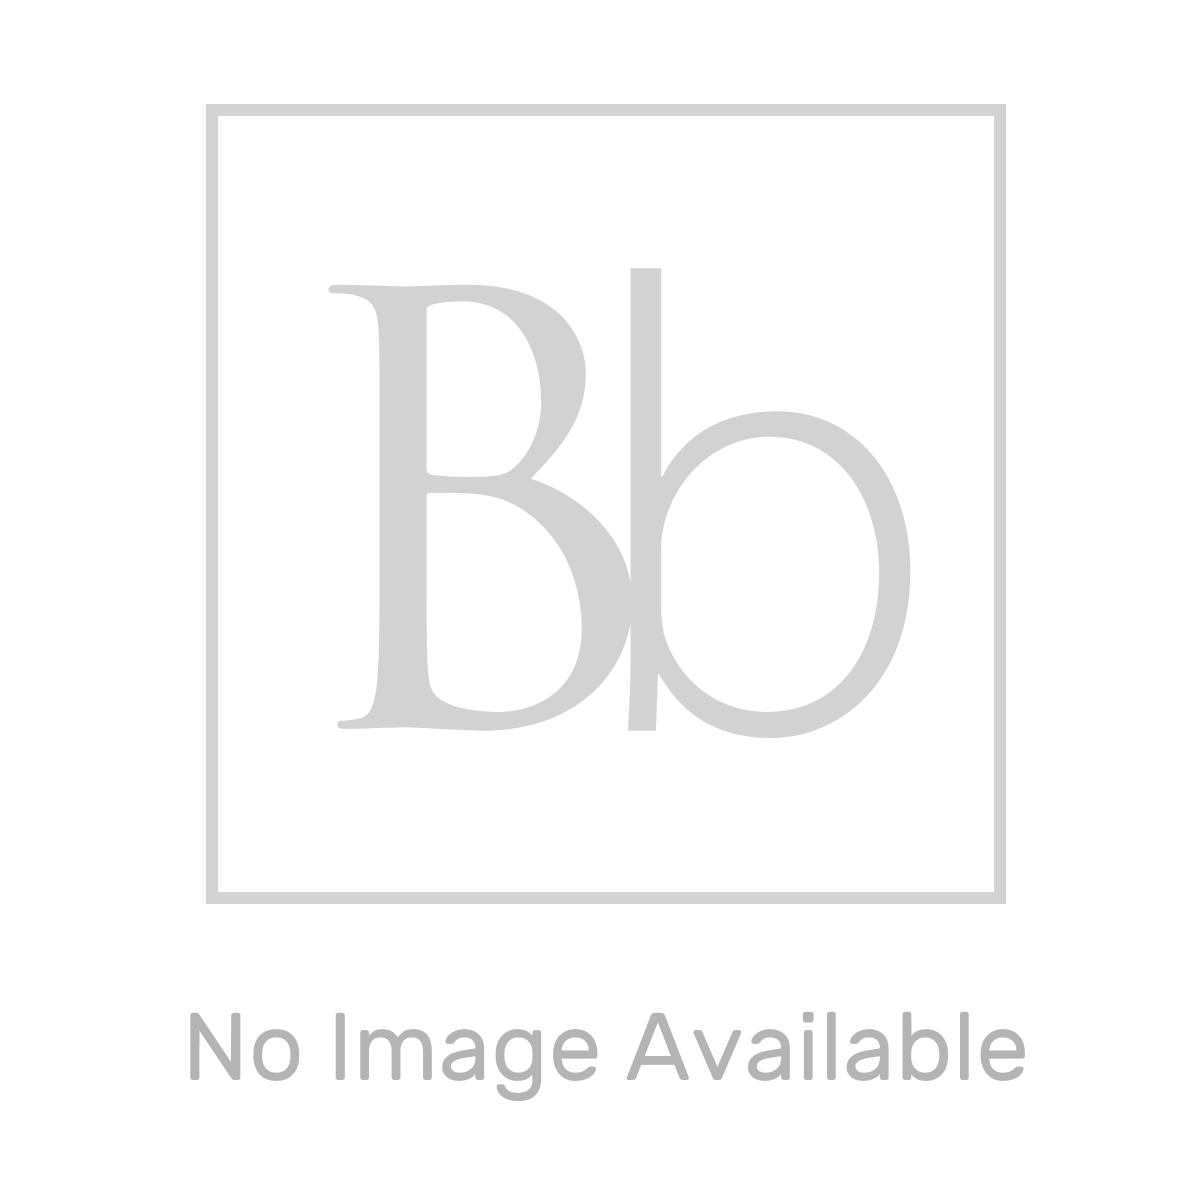 Forum Scorpius 4 Spotlight Bar Fitting